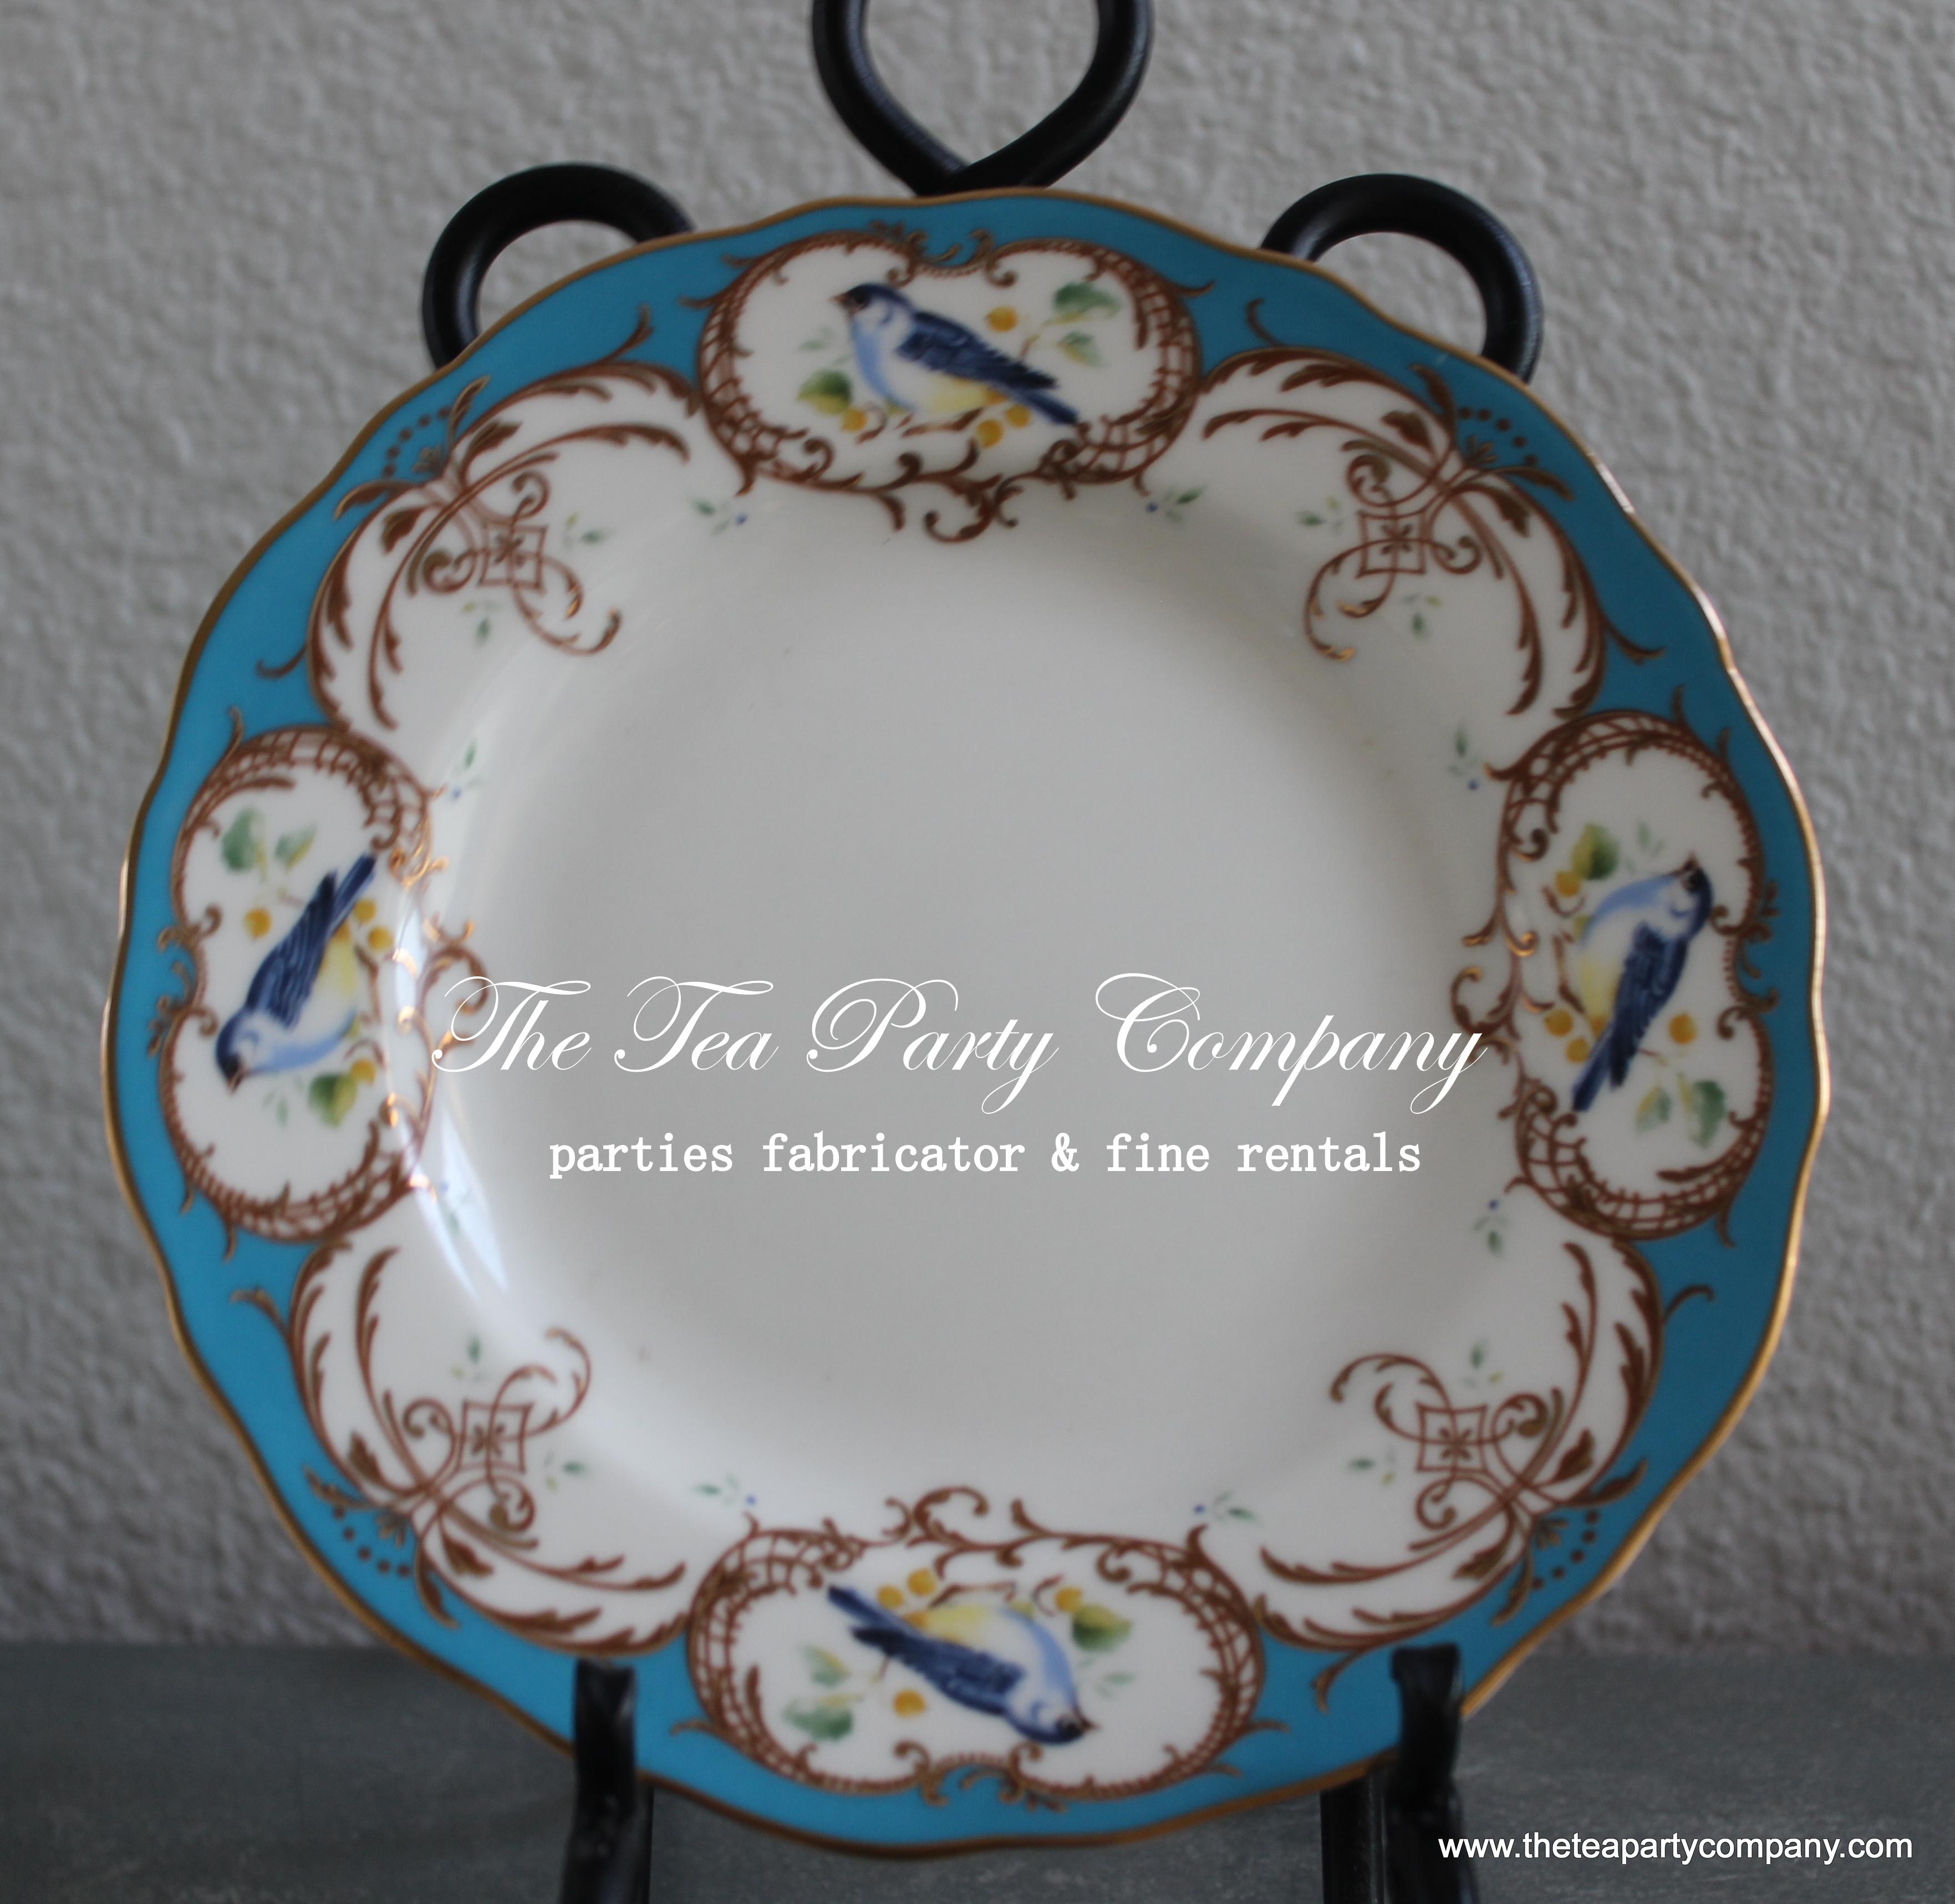 Mismatch Dinner Plates The Tea Party Company (1)